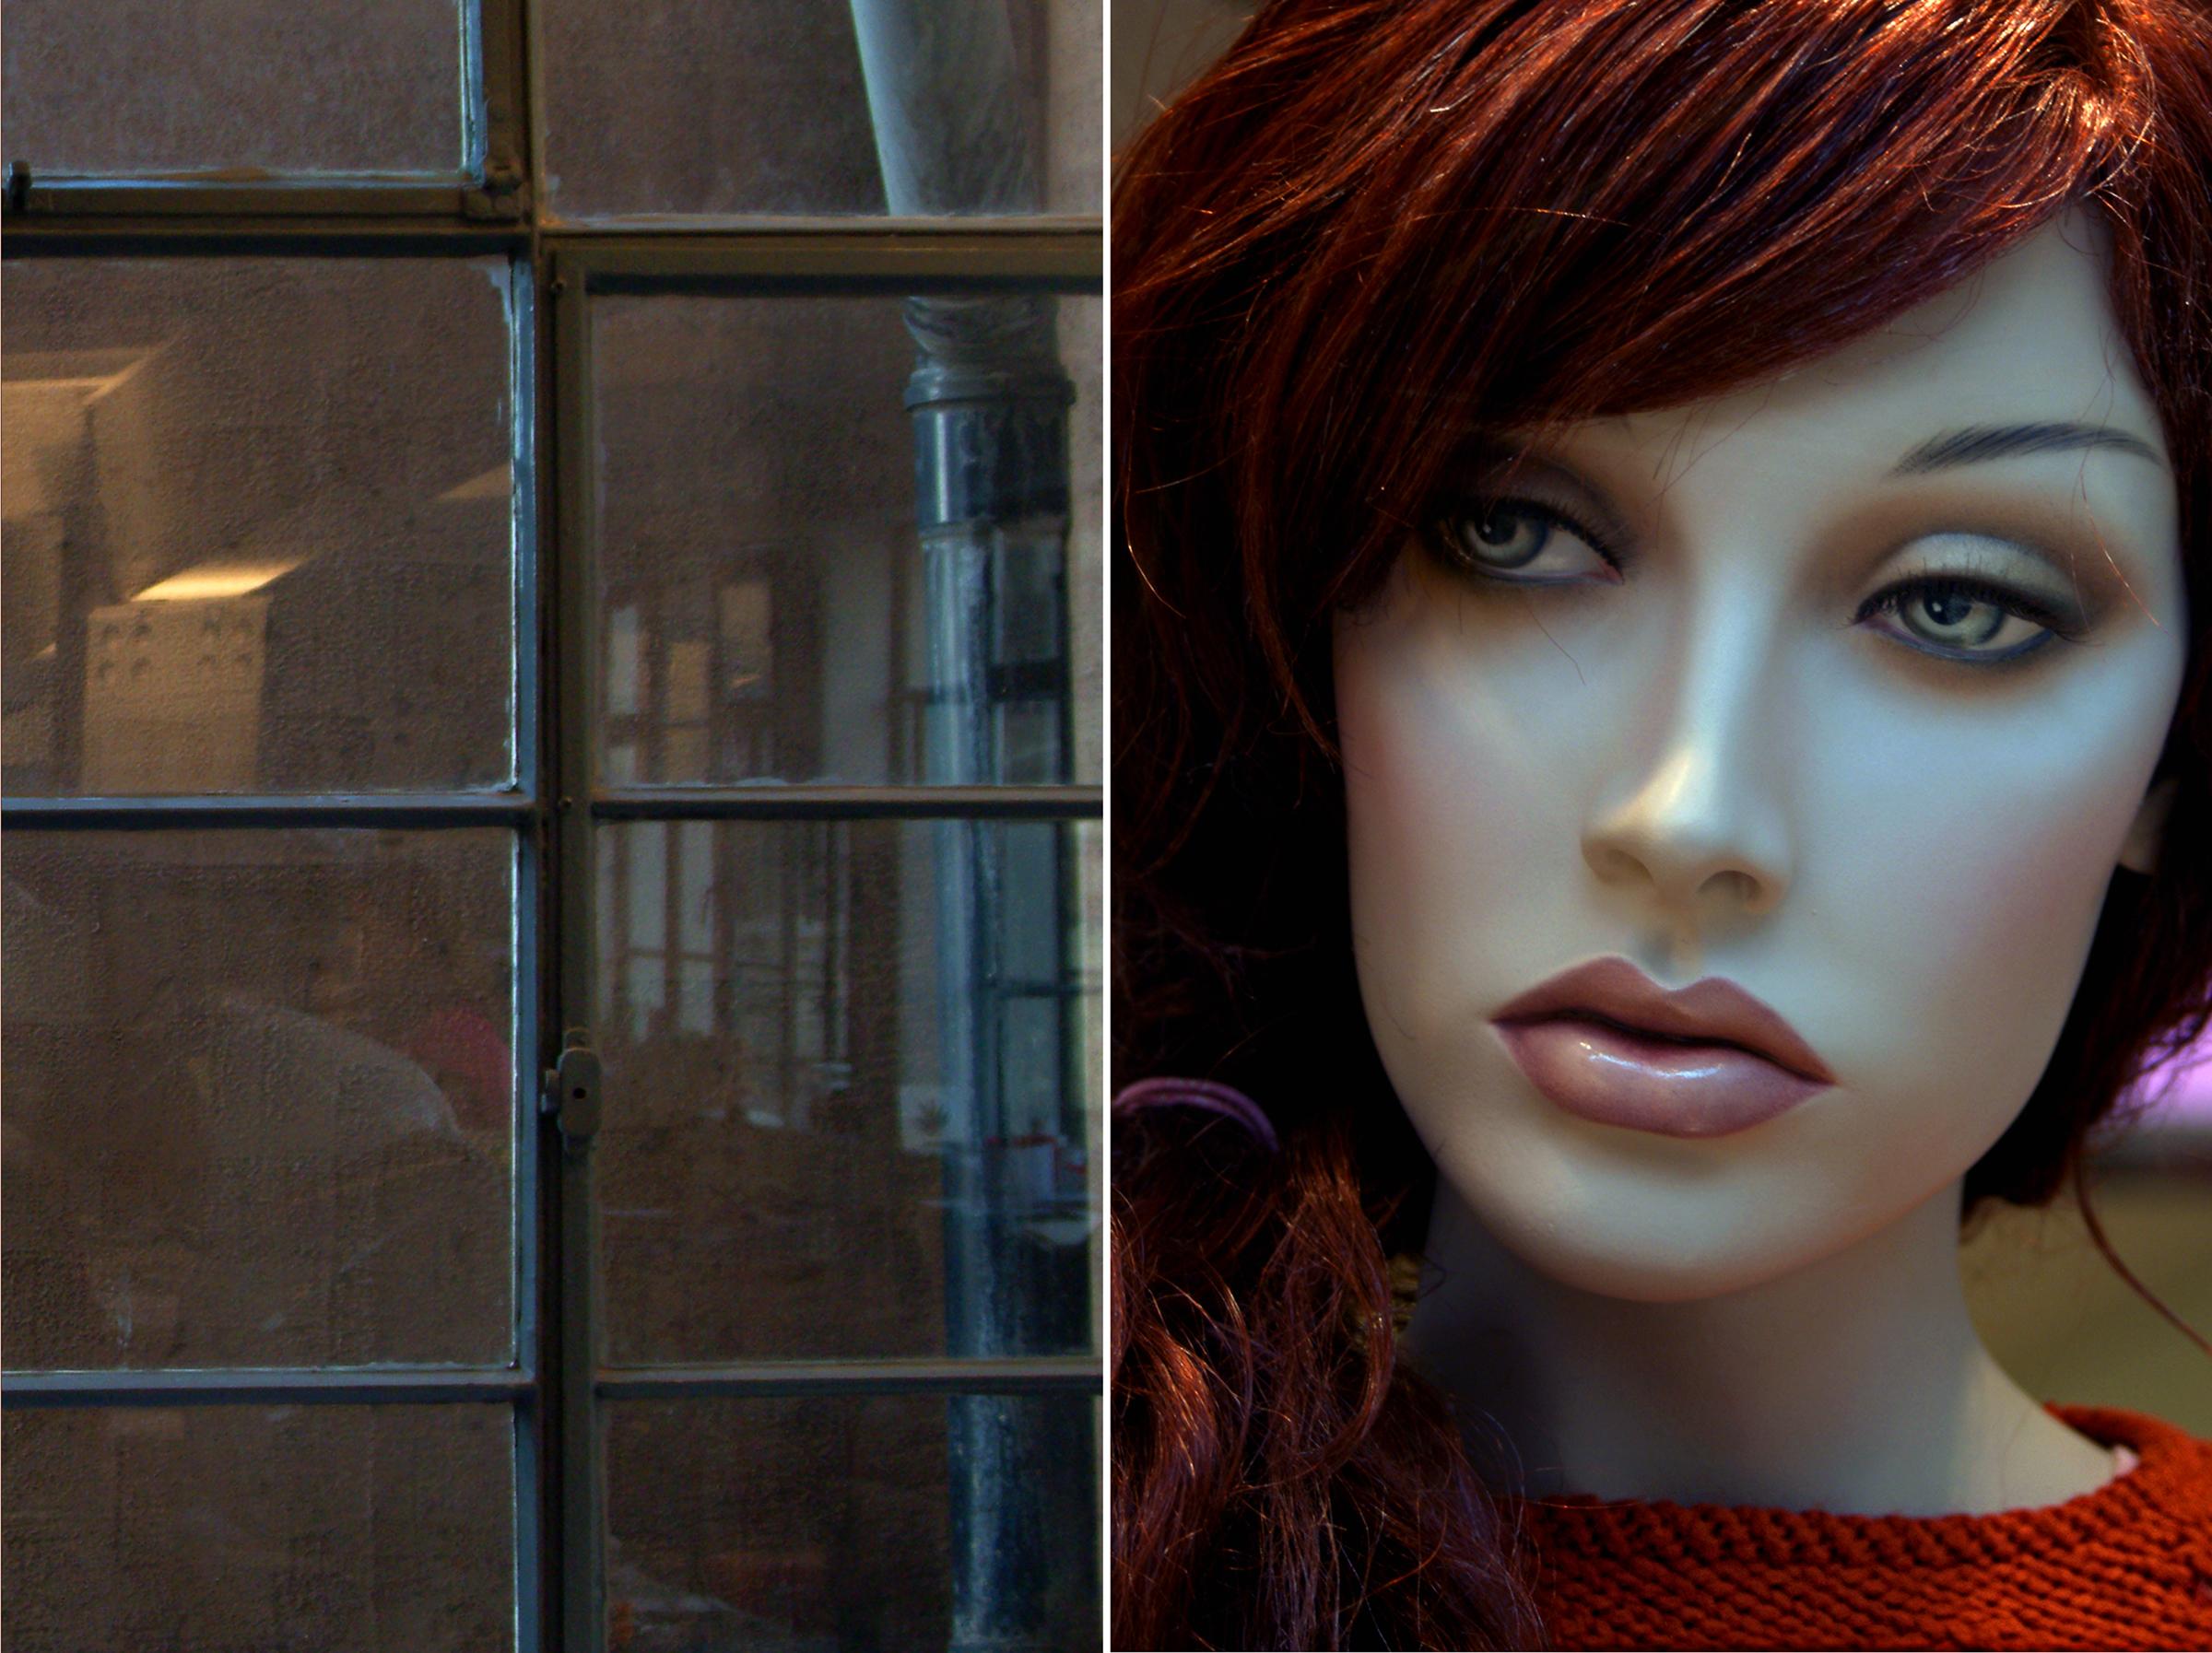 Recoleta Diptych 10 red sweater and storeroom.jpg